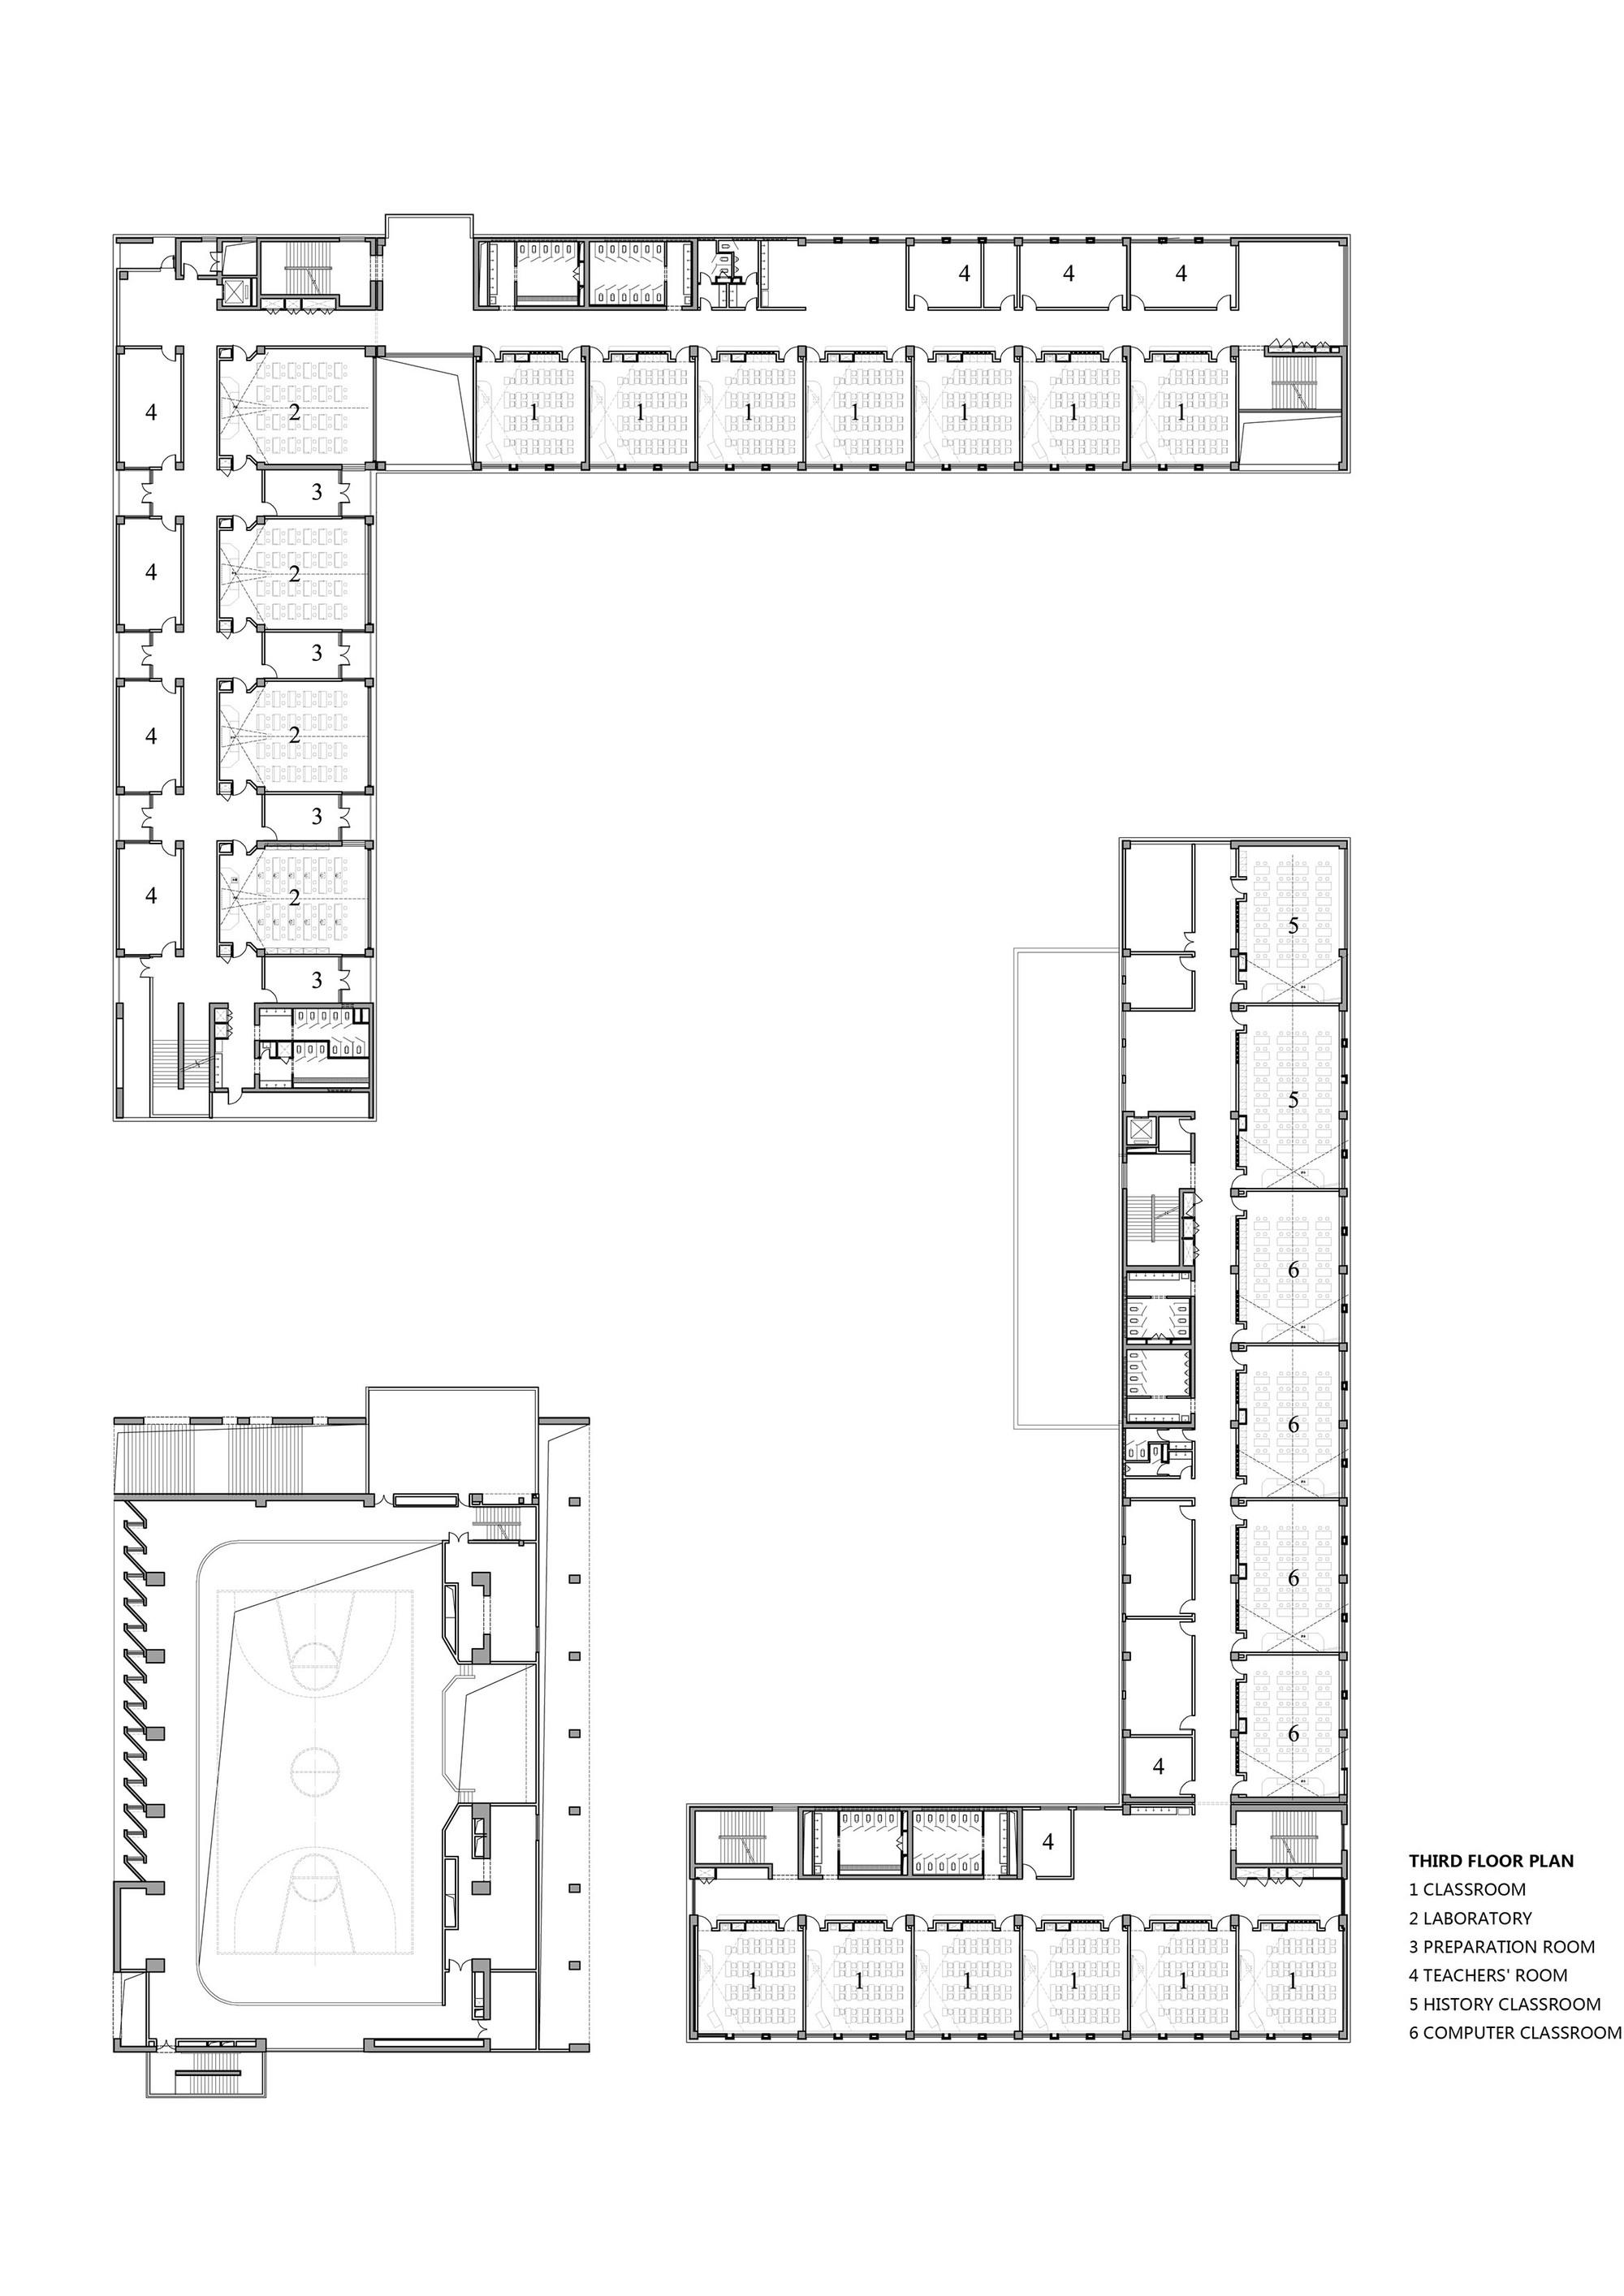 Laboratory Room Design: Gallery Of School With An Open Space / Beijing Institute